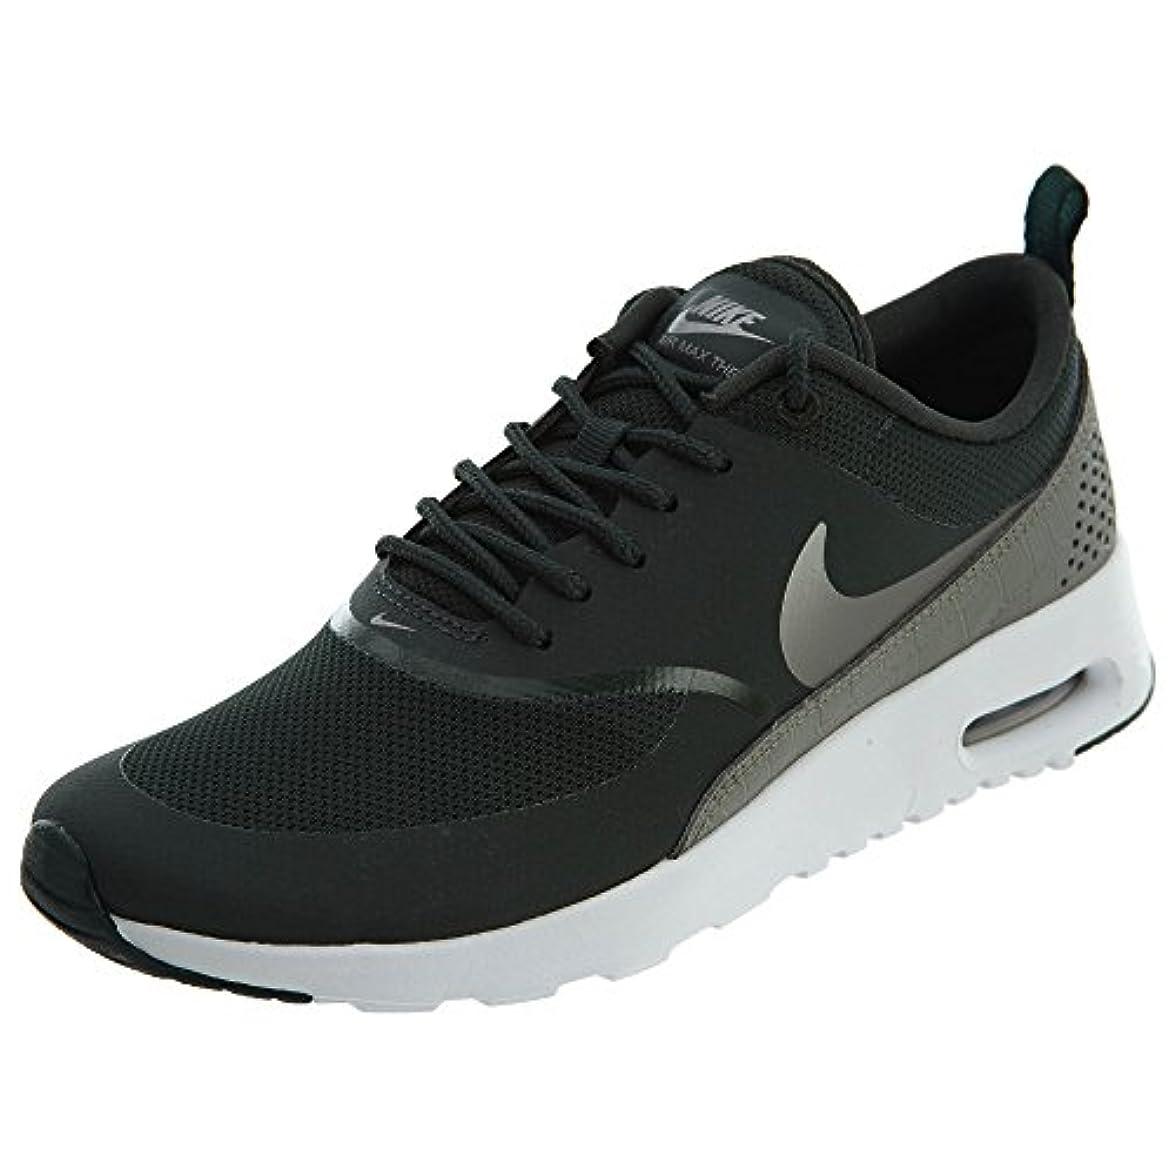 Nike Scarpe Chiuse Donna